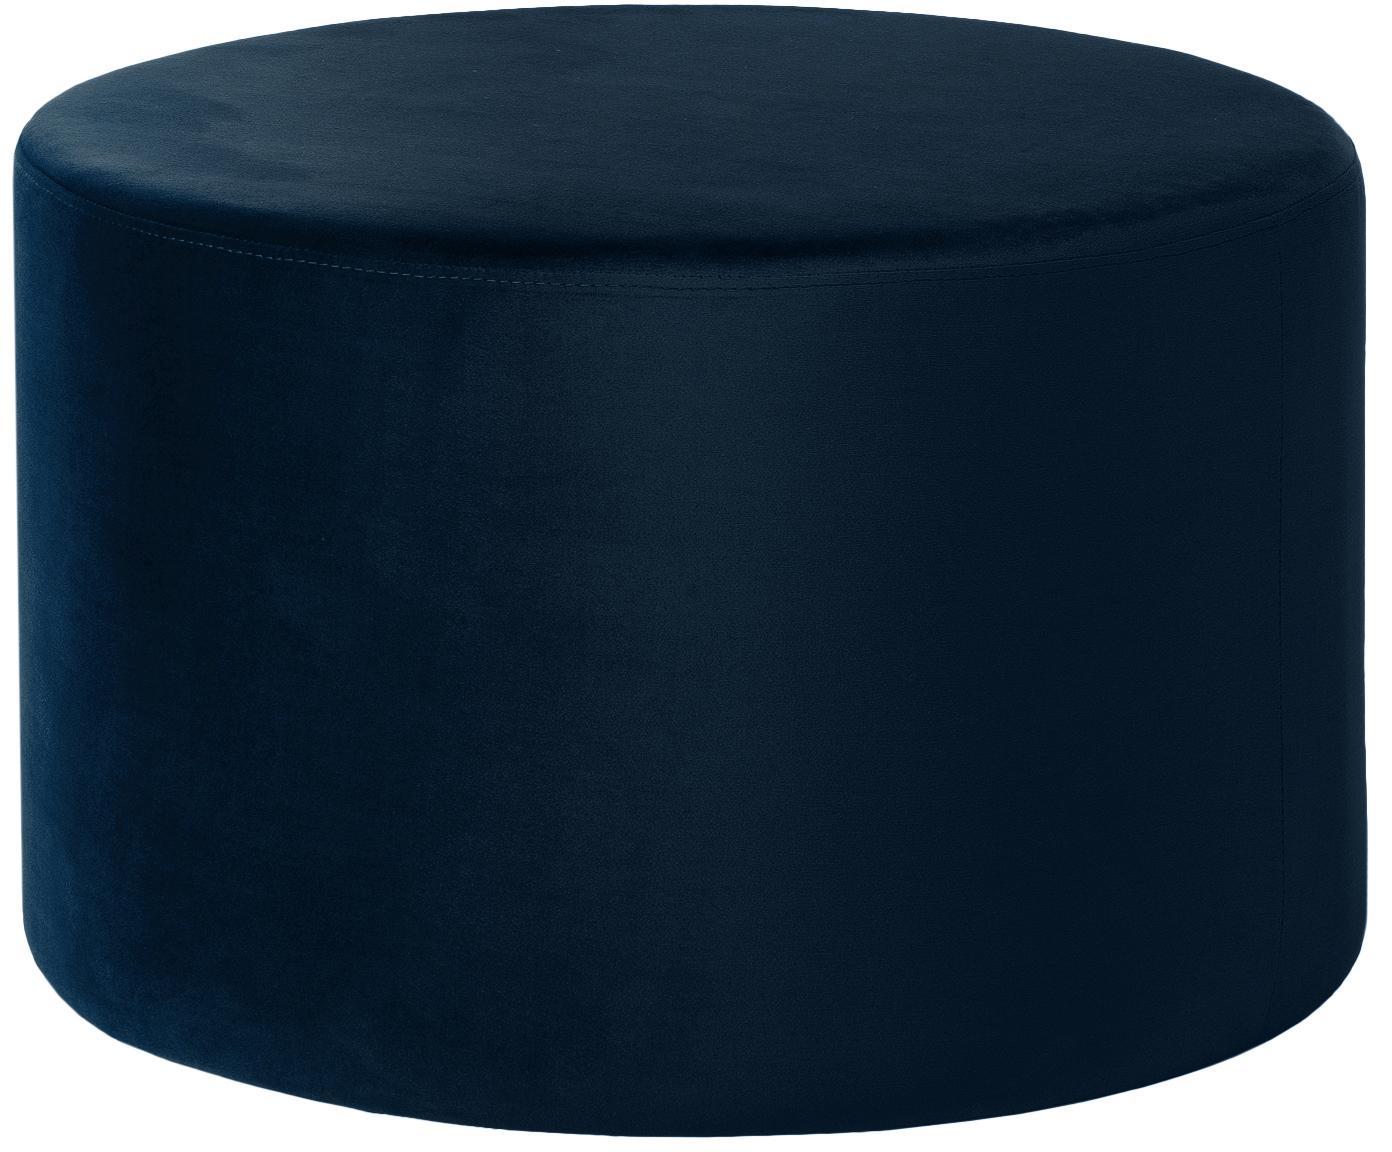 Samt-Hocker Daisy, Bezug: Samt (Polyester) 15.000 S, Rahmen: Mitteldichte Holzfaserpla, Navyblau, Ø 60 x H 41 cm